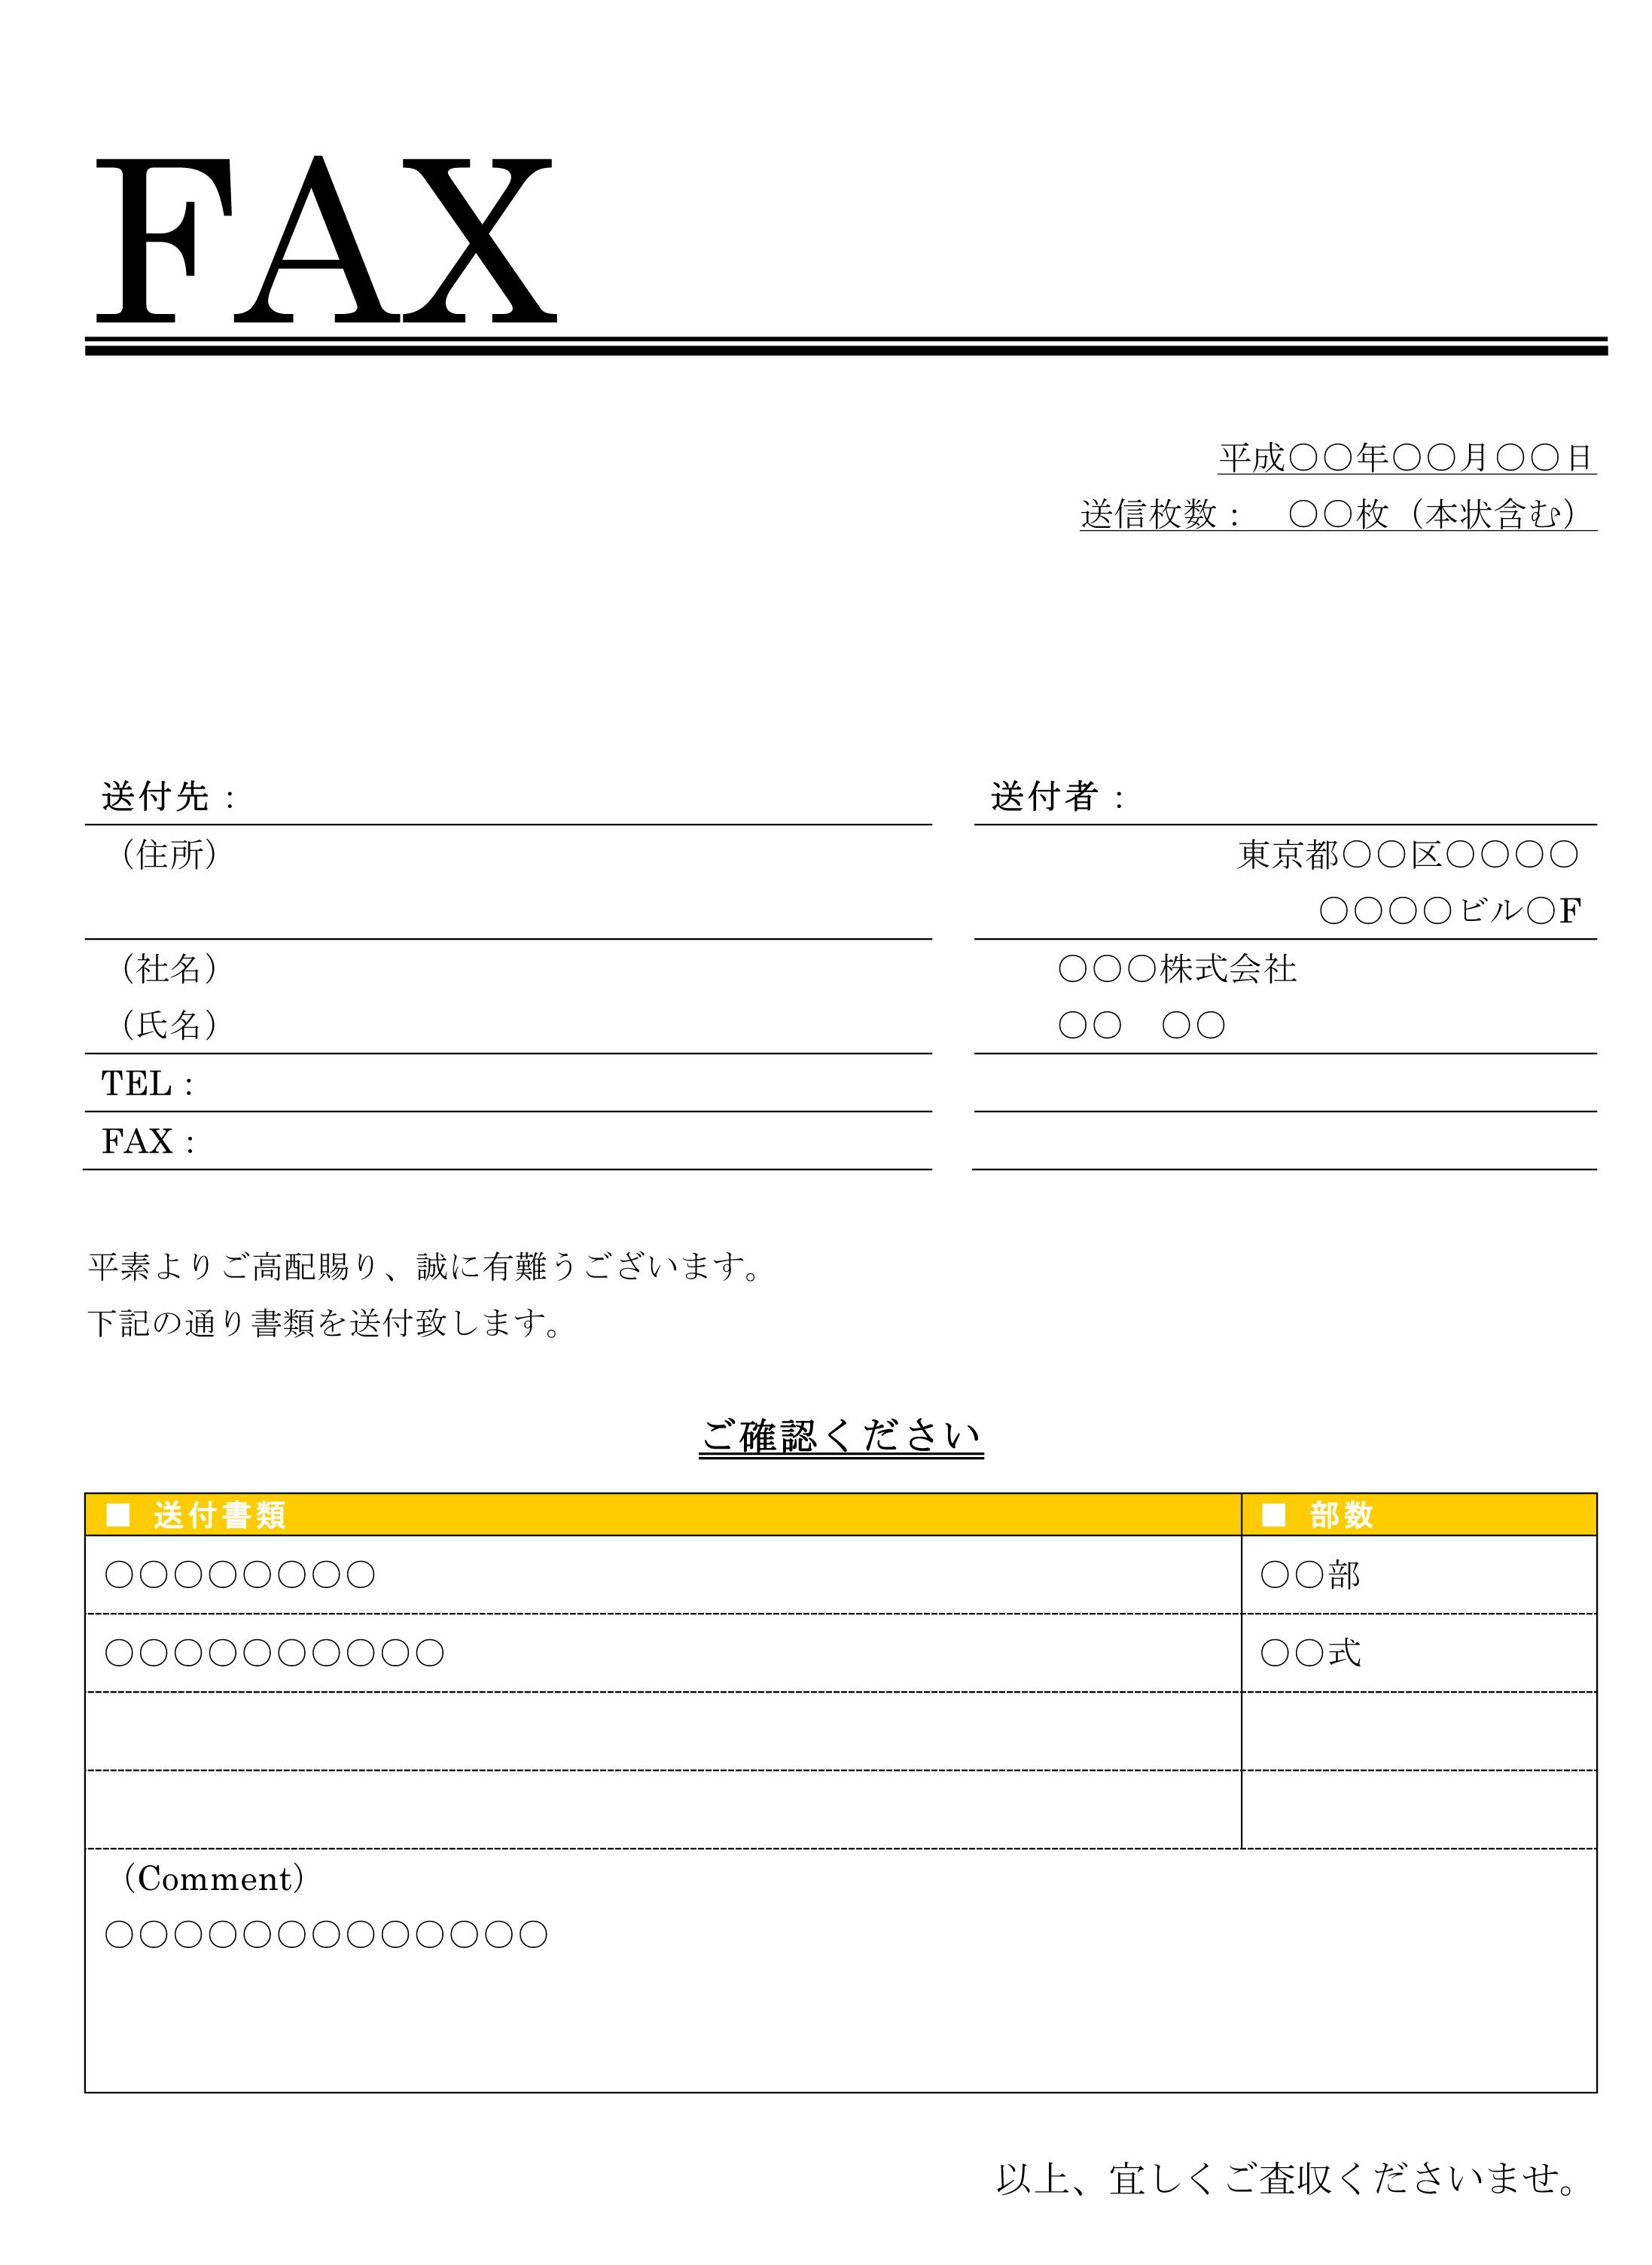 fax送付状_6